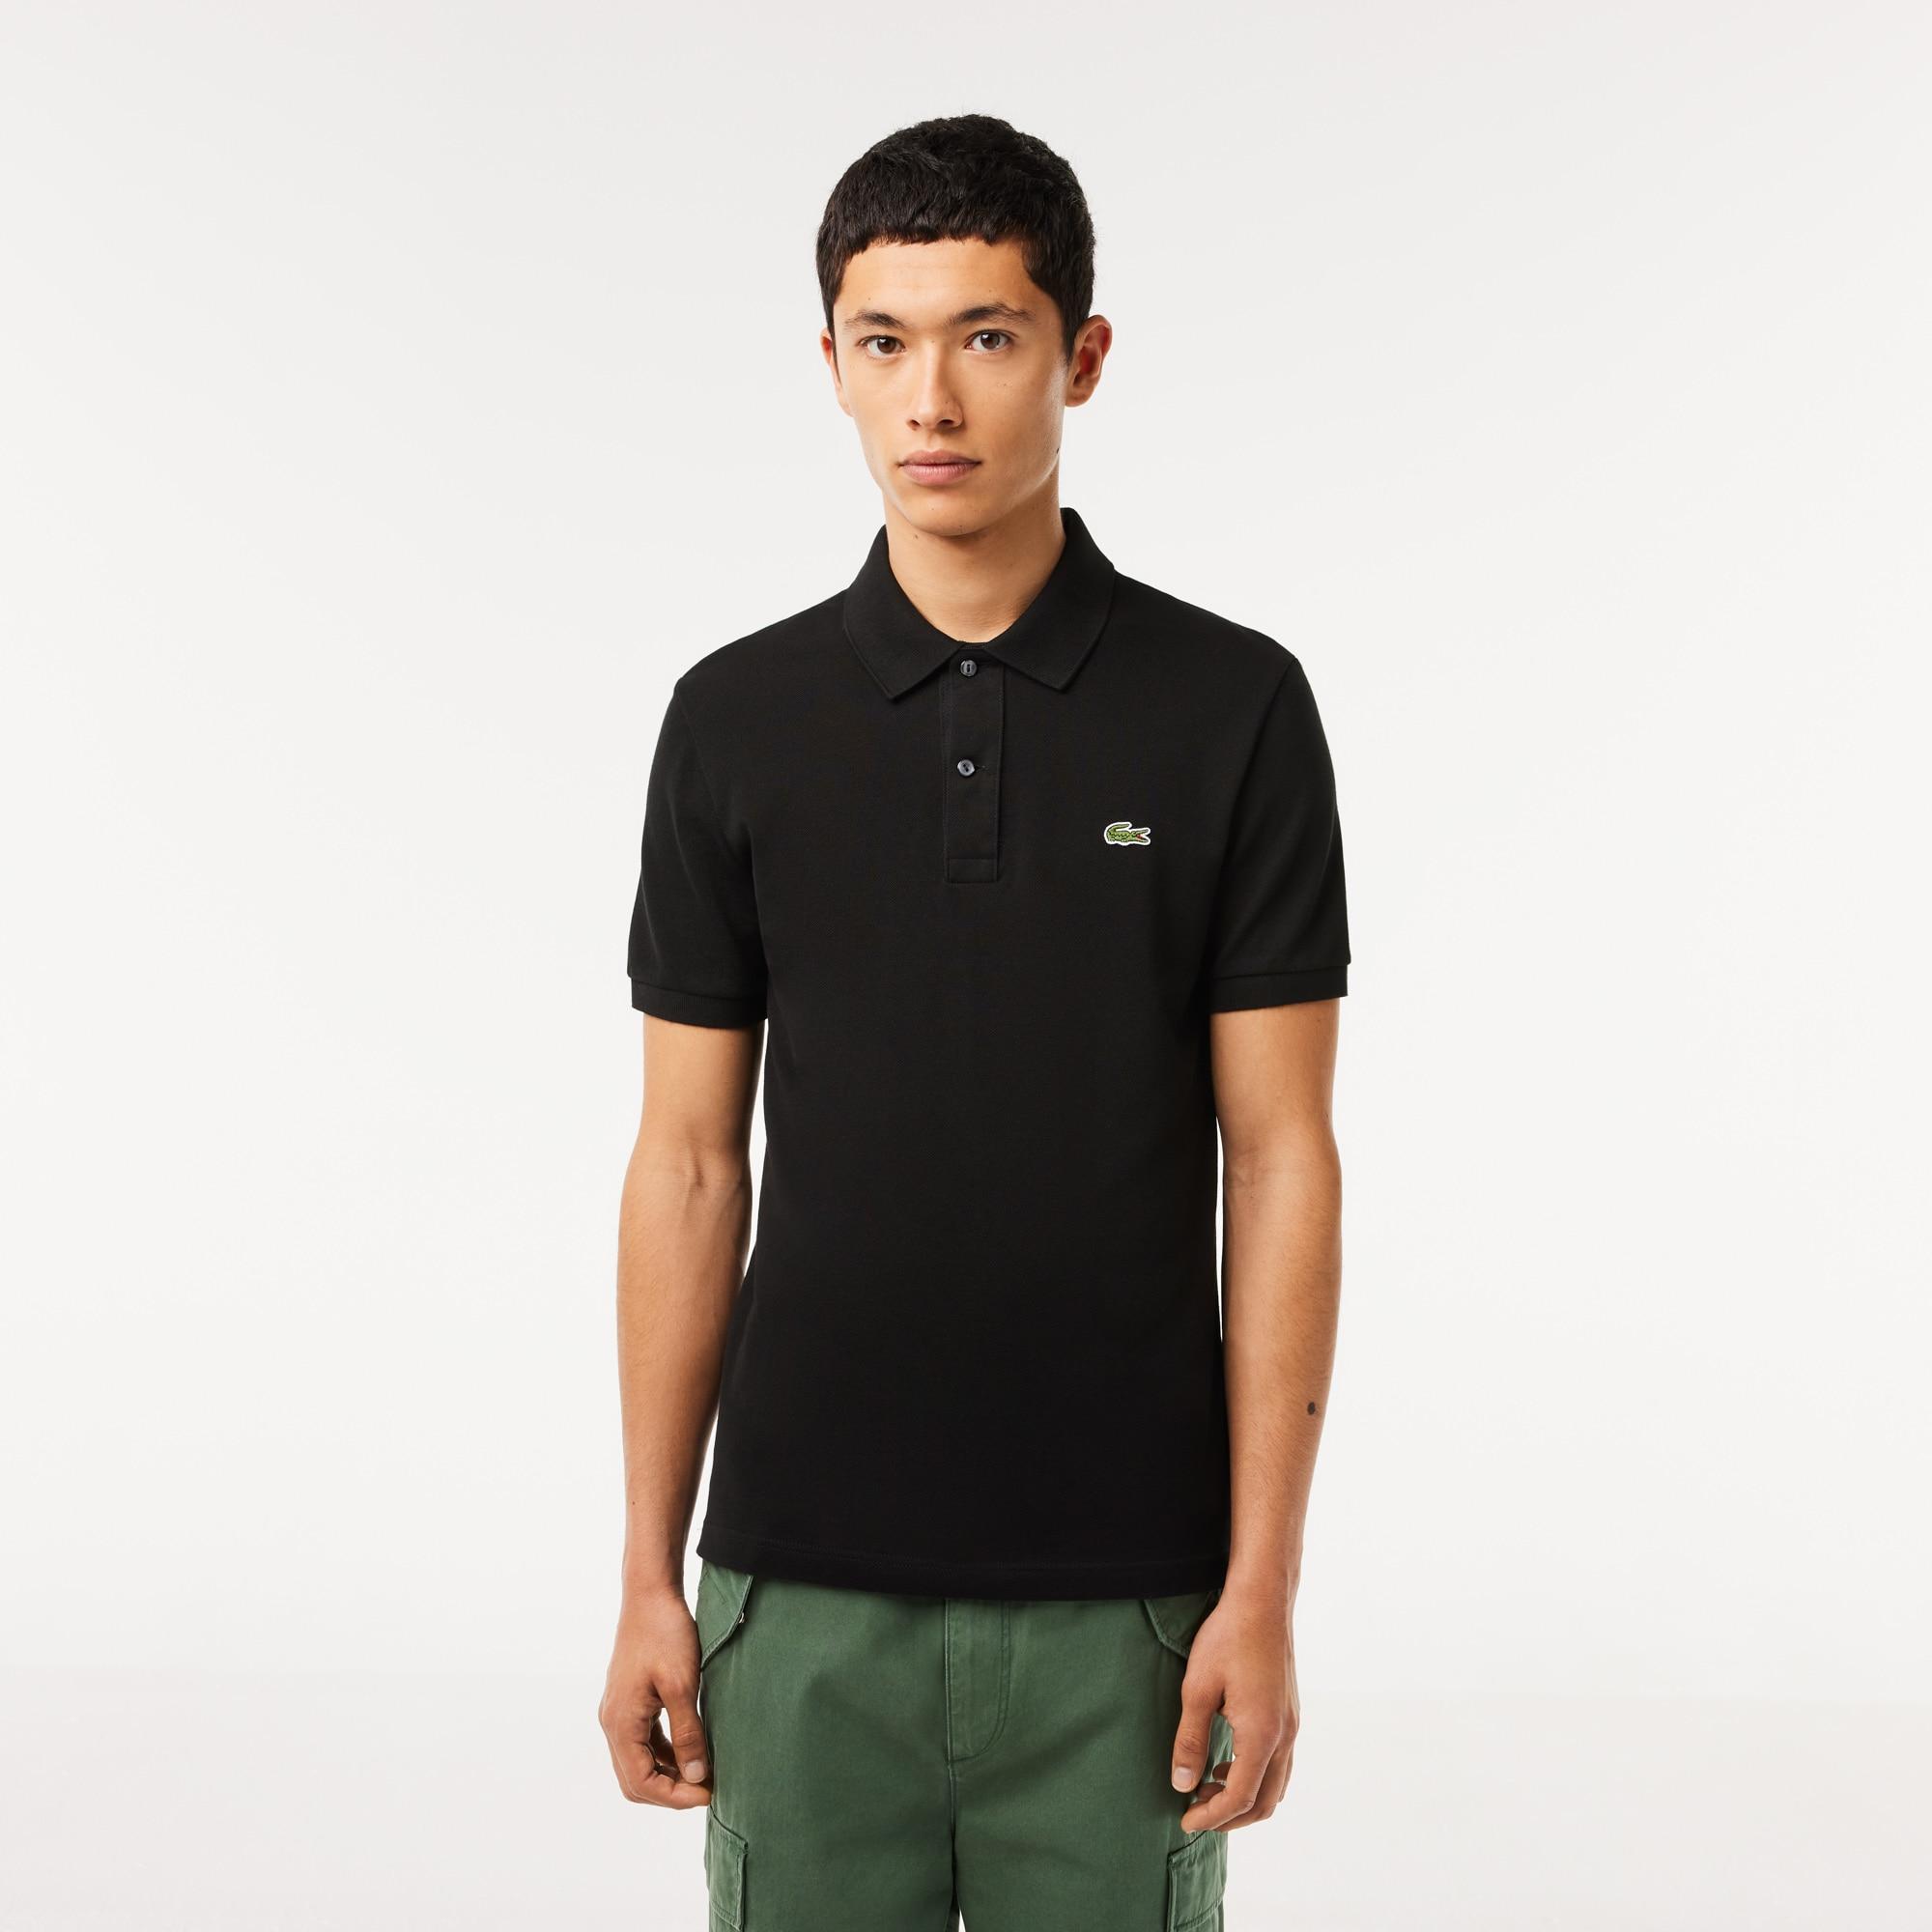 794d02a05a12a Camisas polo para homens, manga longa e manga curta   LACOSTE